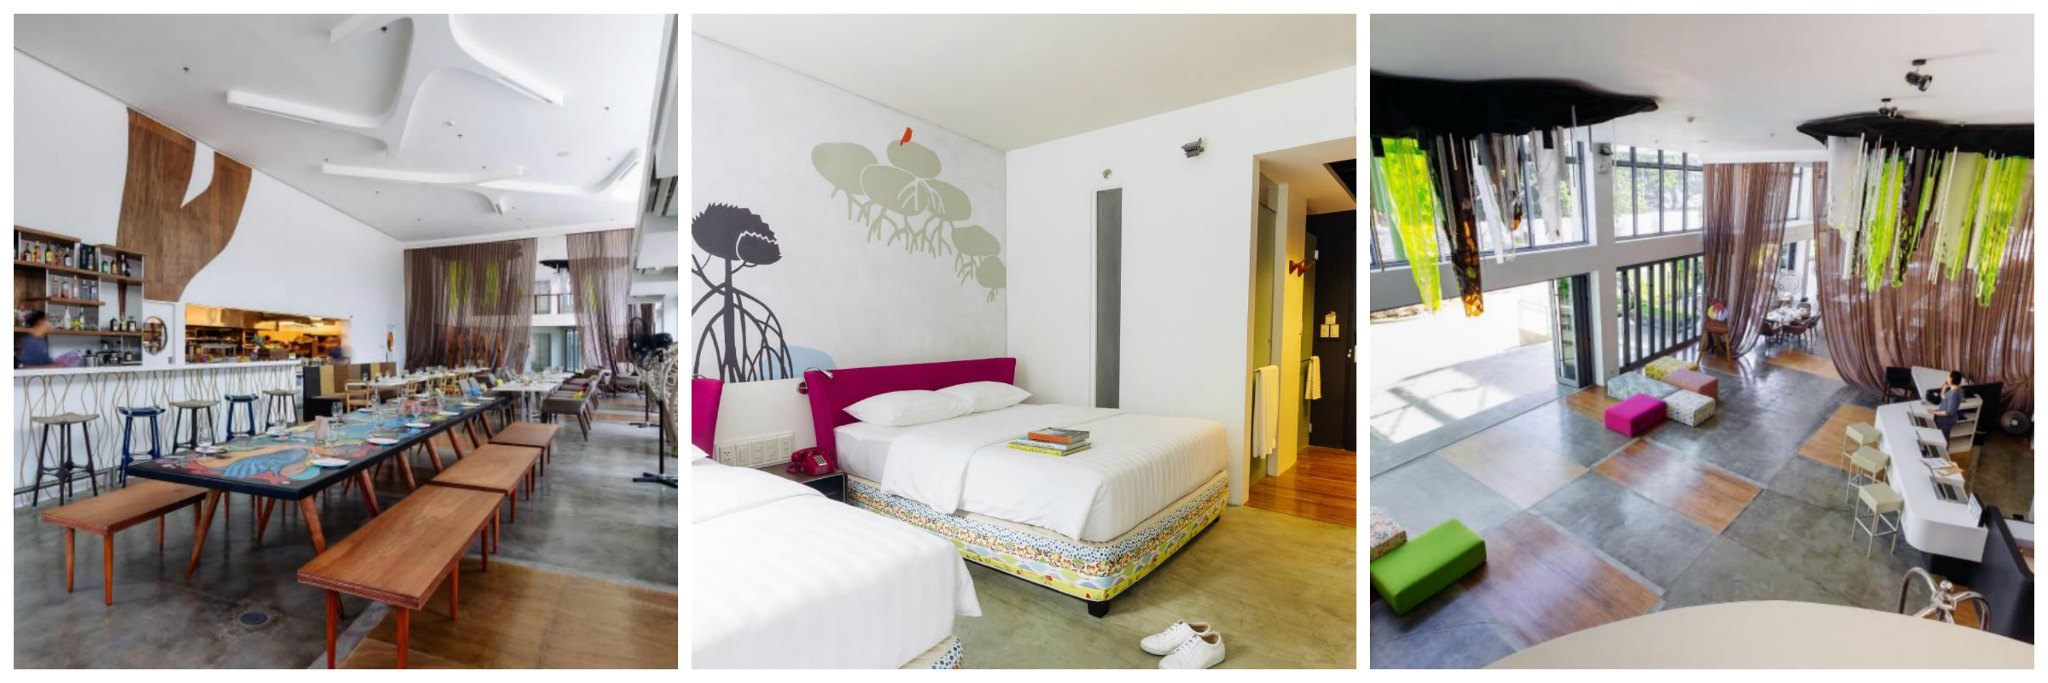 agoda canvas hotel